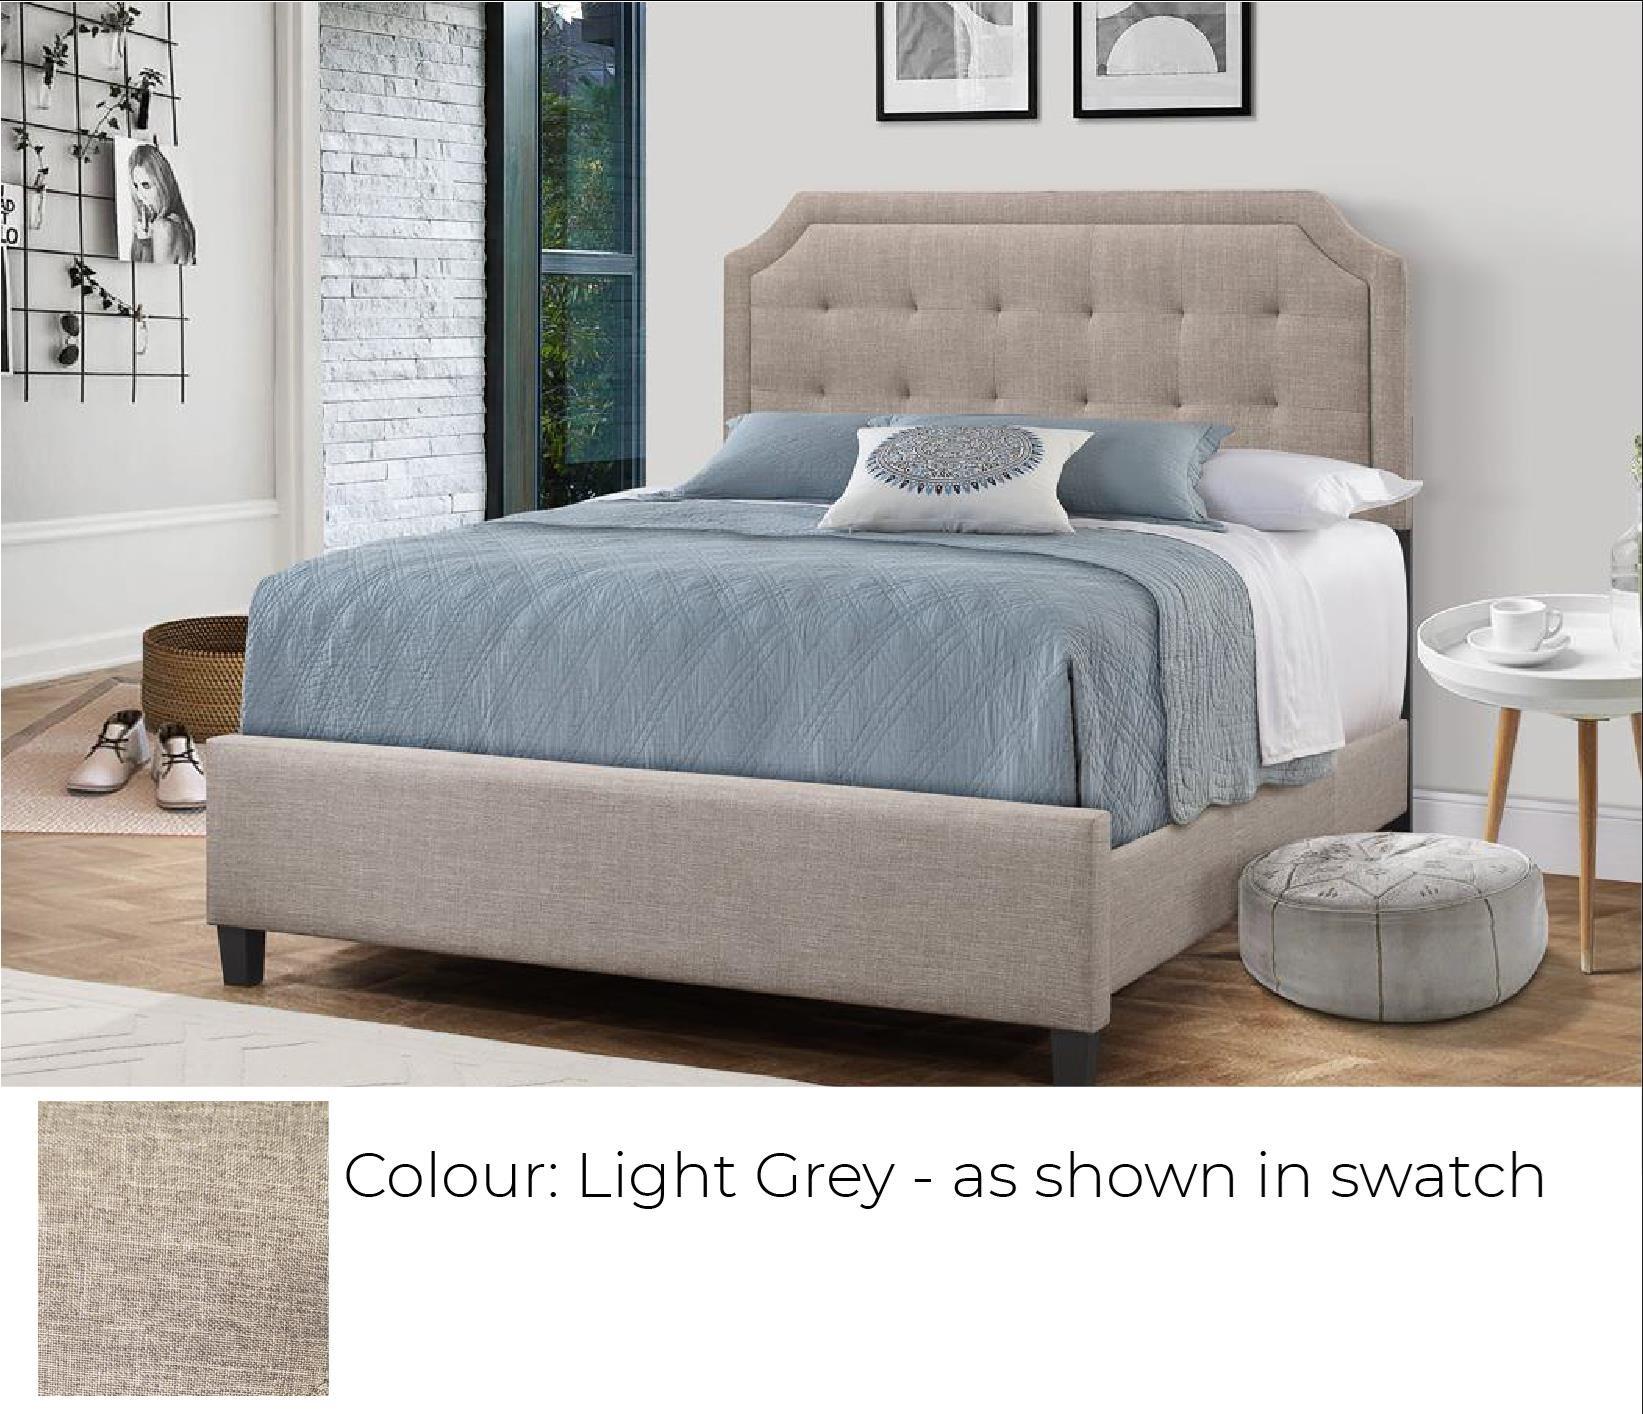 Upholstered Bed - Light Grey